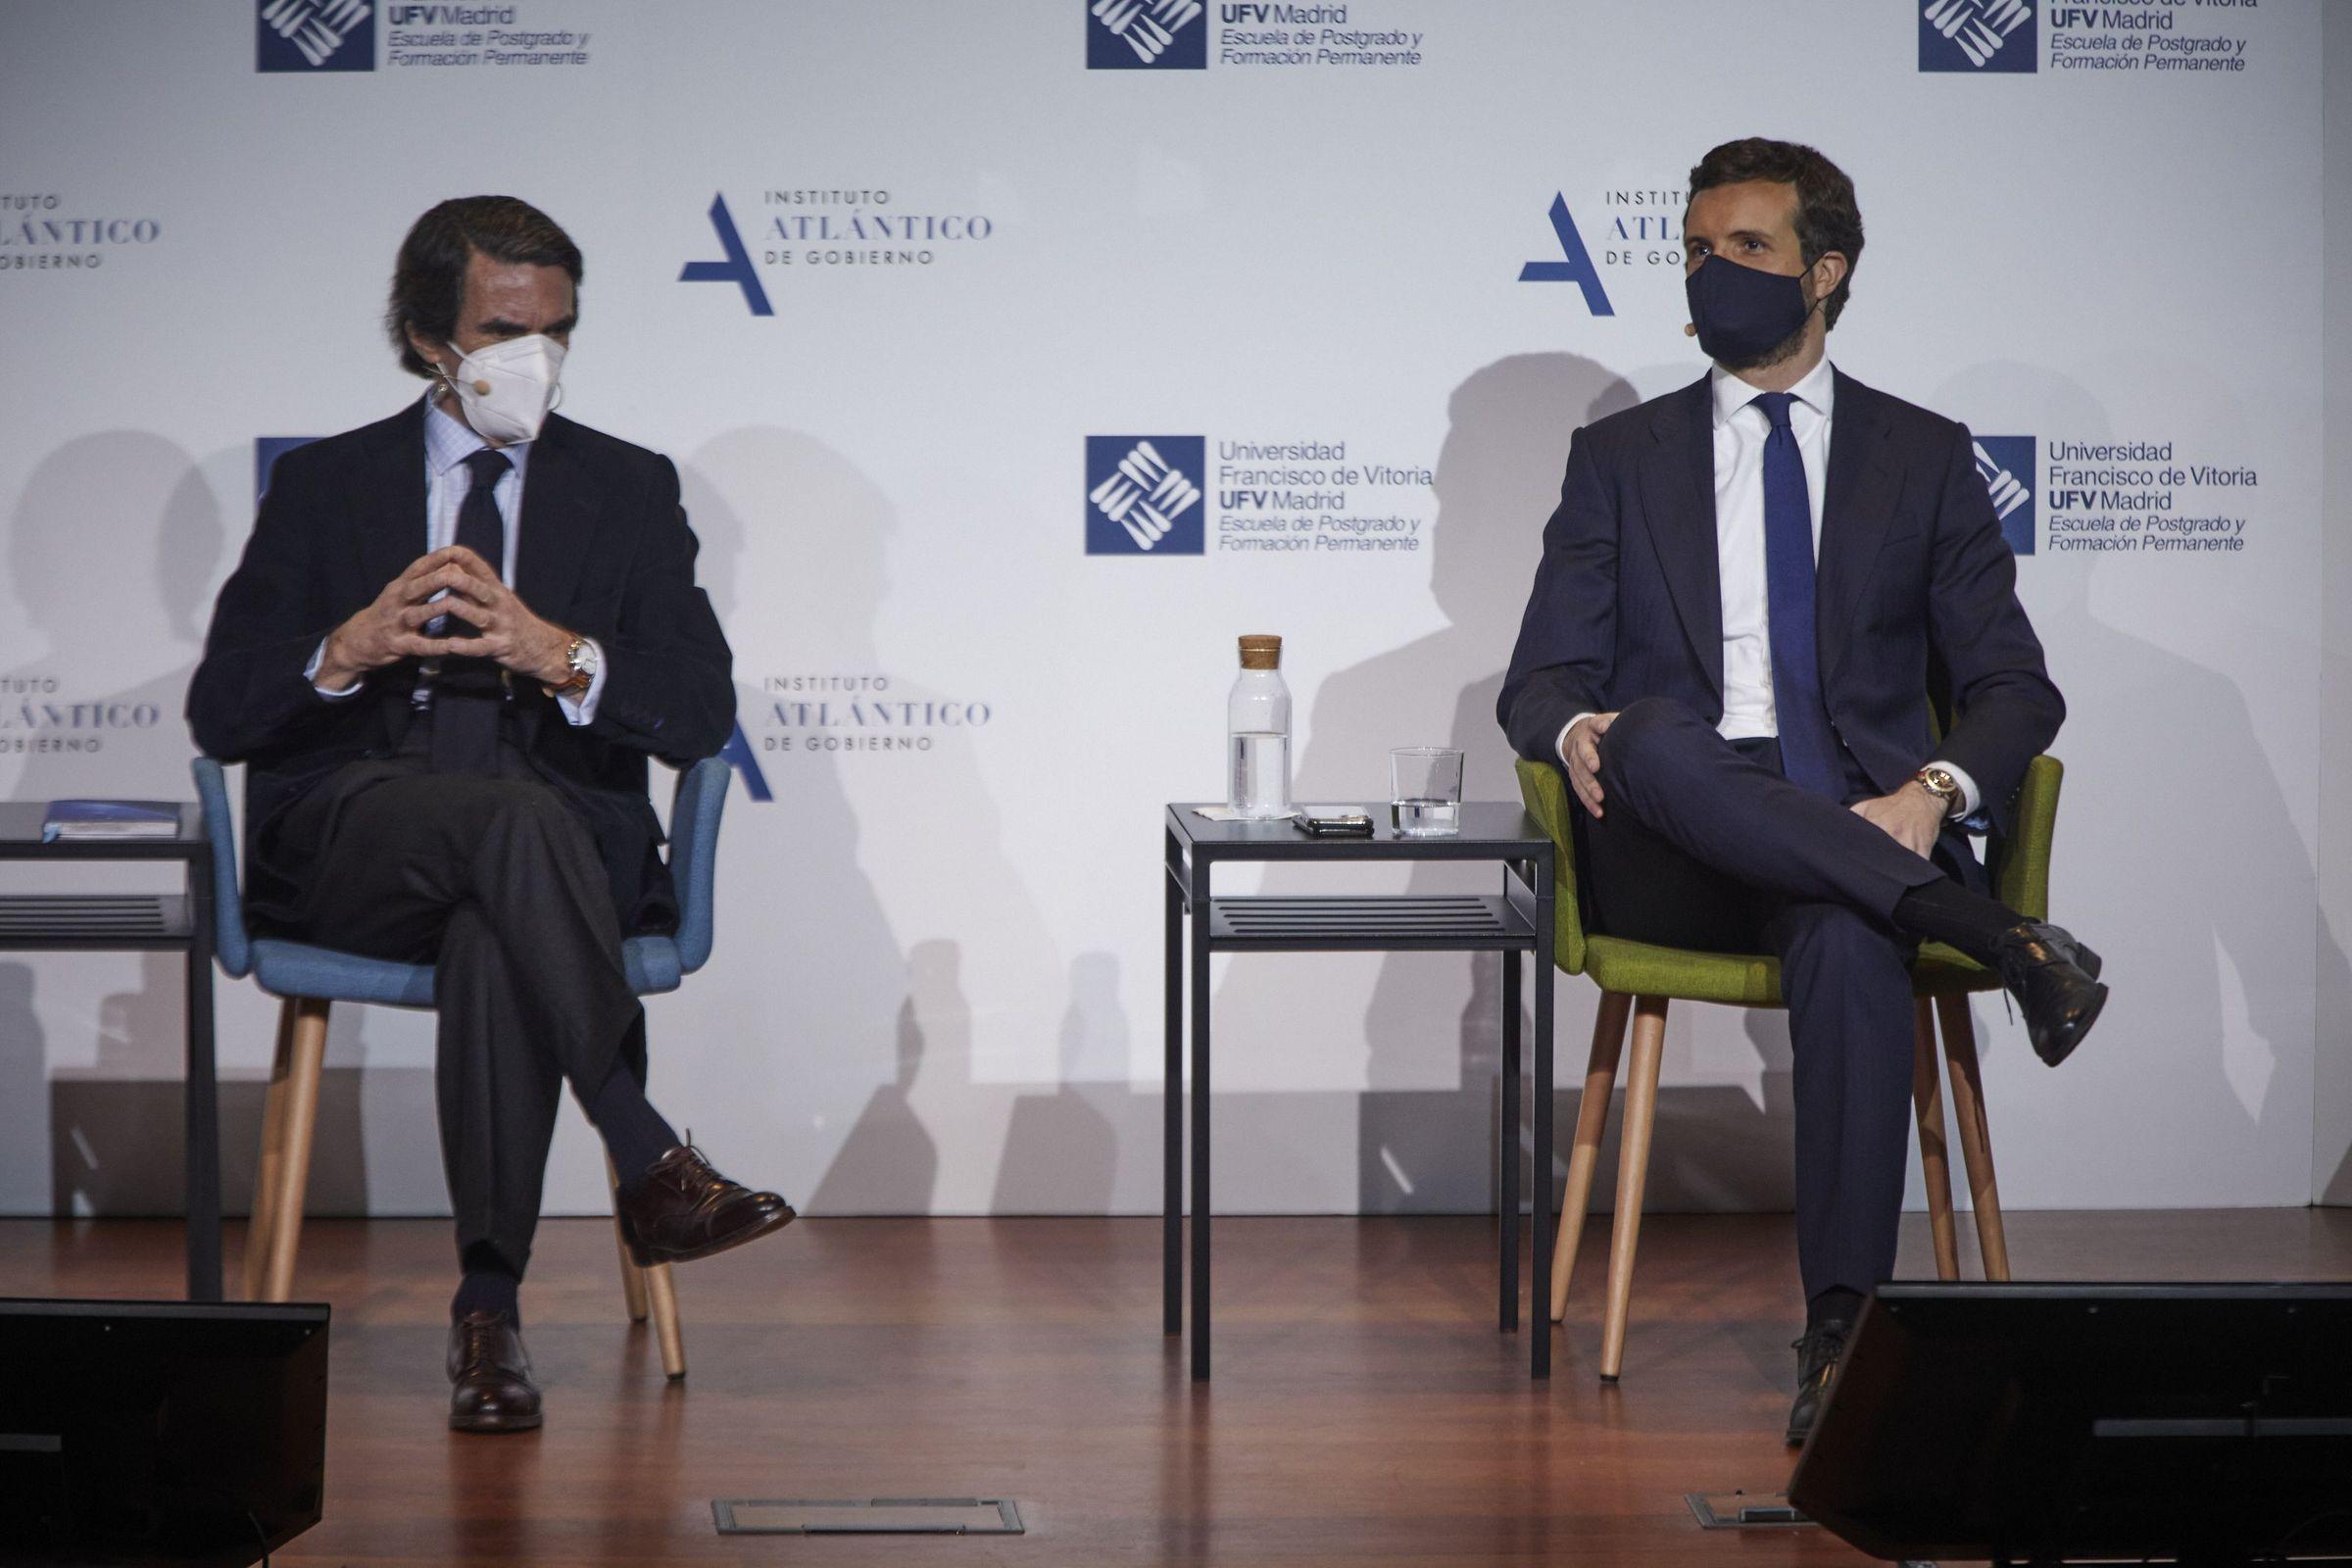 Obras en la variante de Pajares.Aznar junto a Rajoy en el Comité Ejecutivo Nacional del 21 de diciembre del 2015